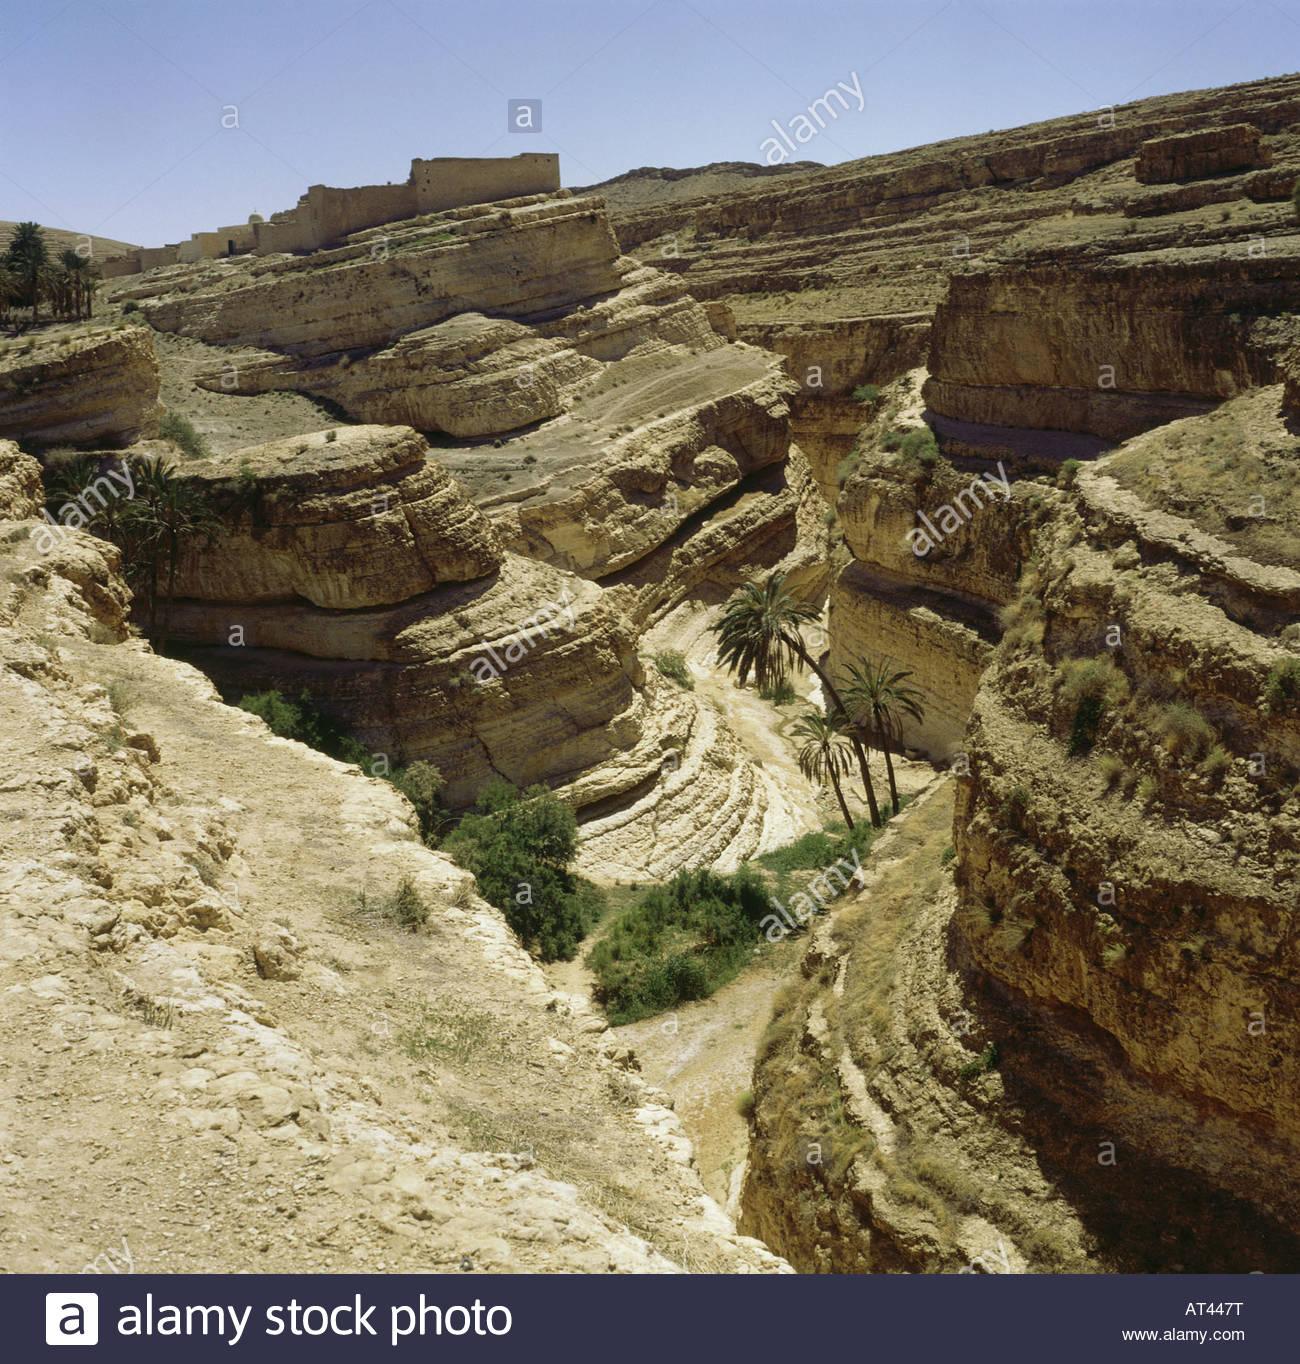 Travel Geography: Mides Tunisia Stock Photos & Mides Tunisia Stock Images